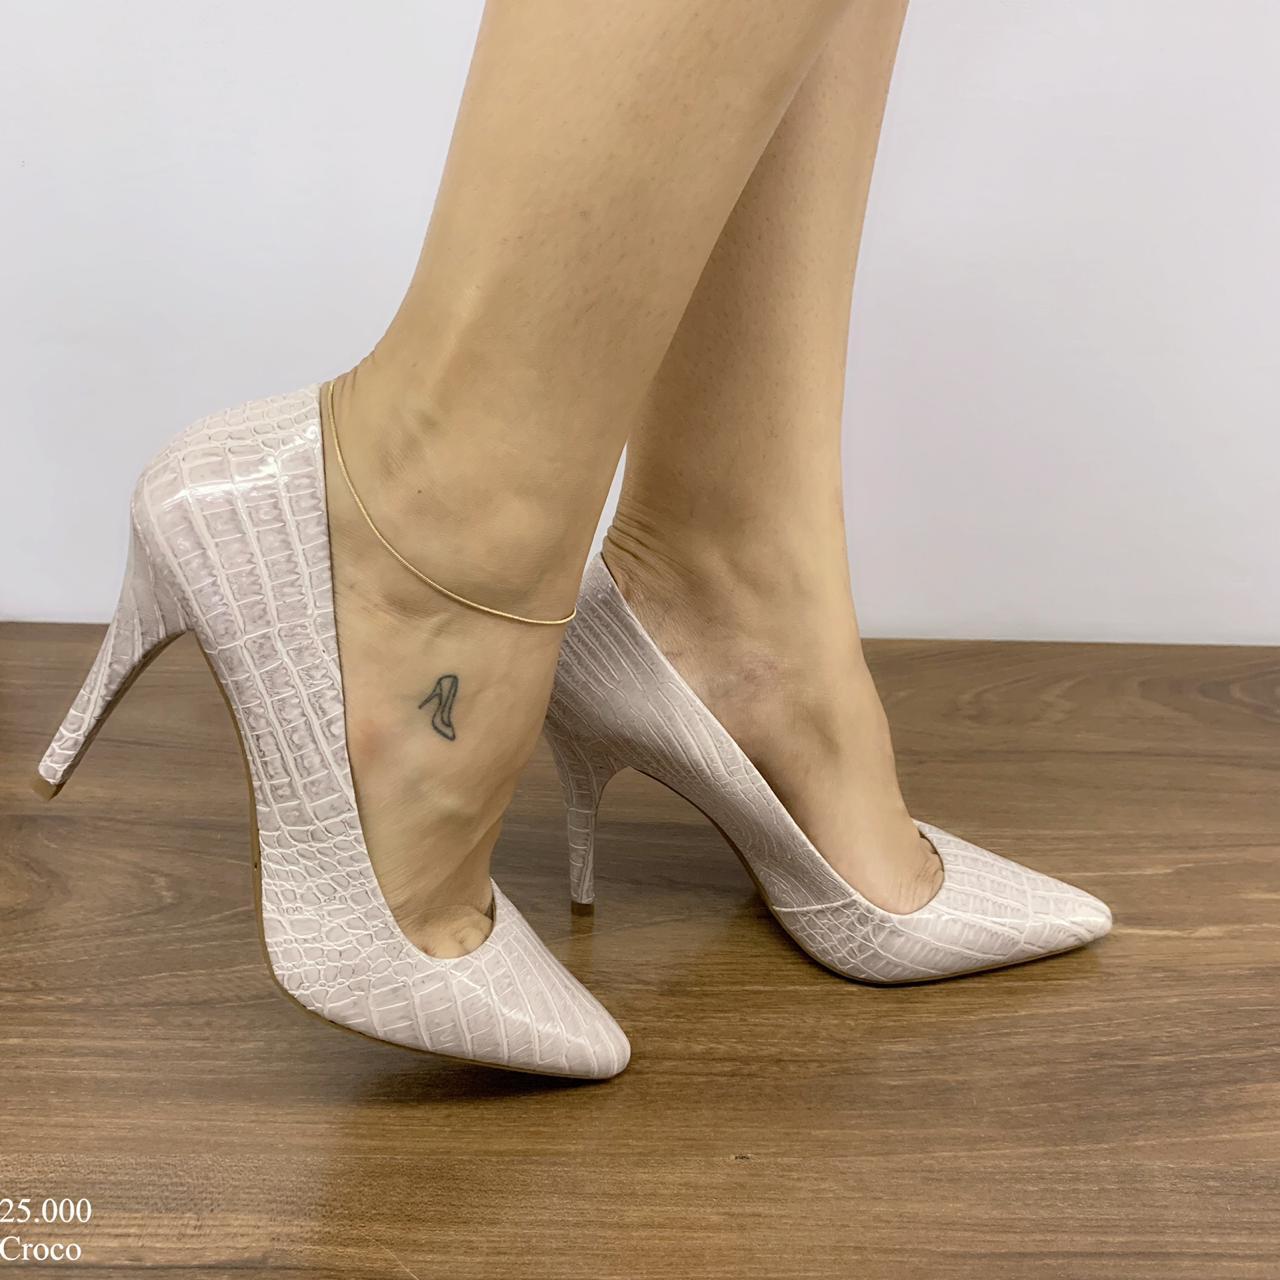 Scarpin Feminino Creme Croco | D- 25.000-01